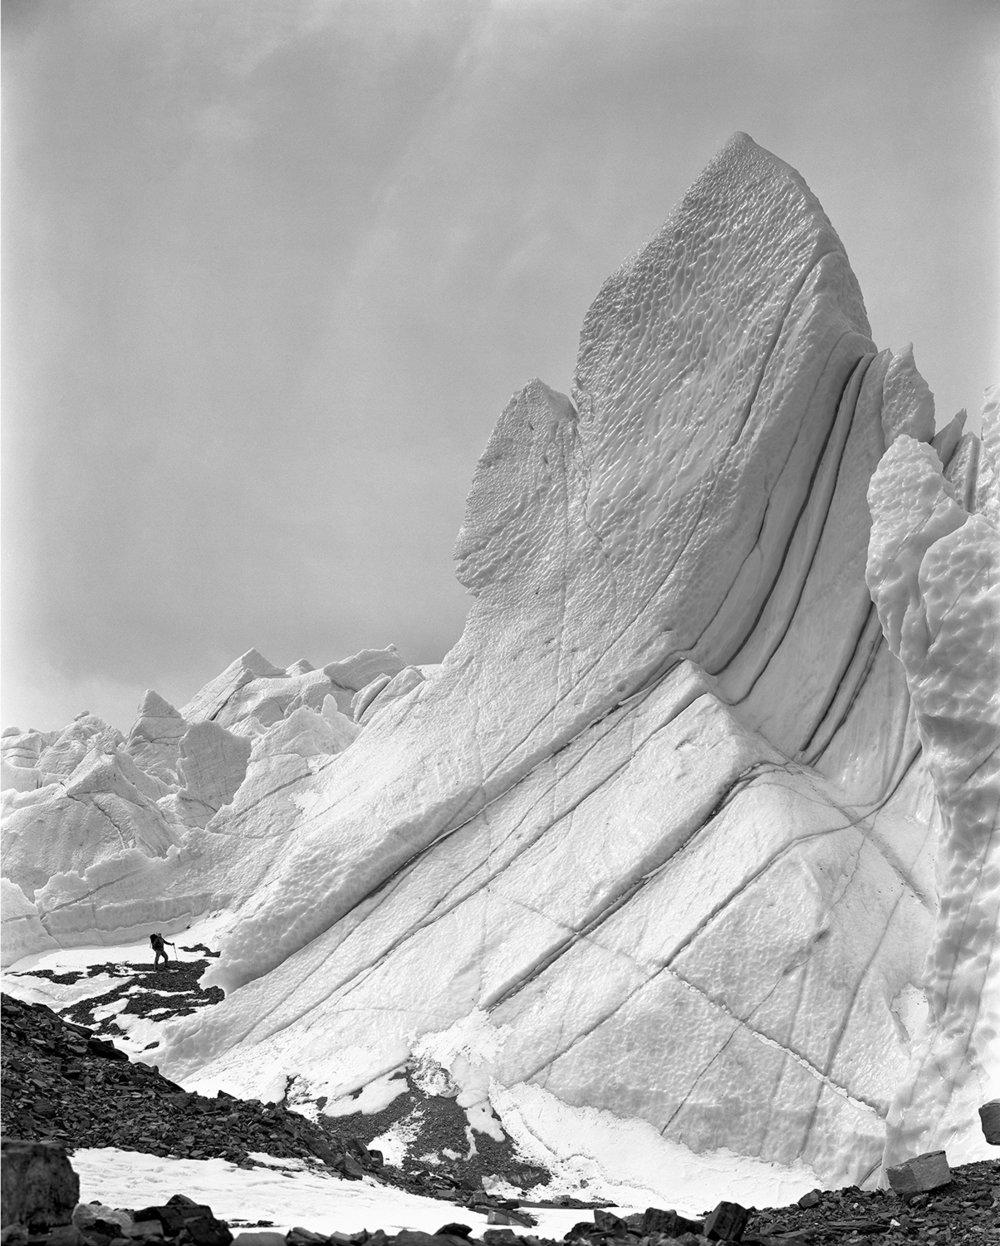 Penitenti East Rongbuk Glacier, Tibet